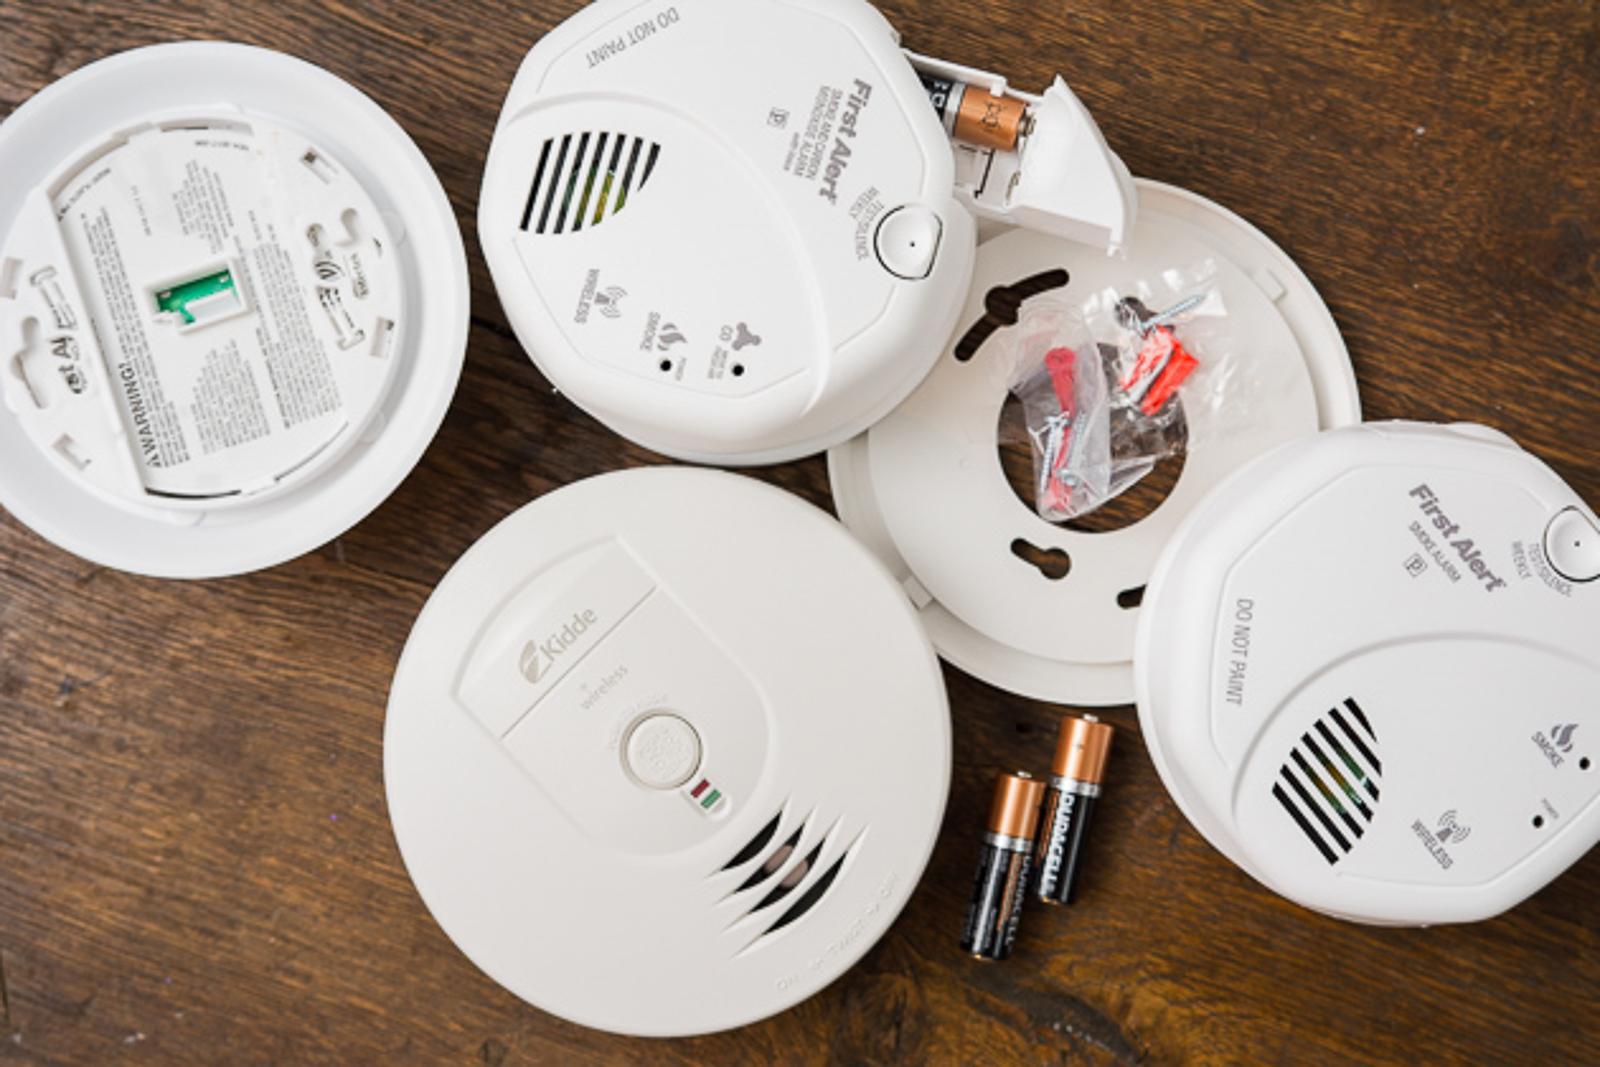 - 02 basic smoke detectors 1600 - The best basic smoke alarm